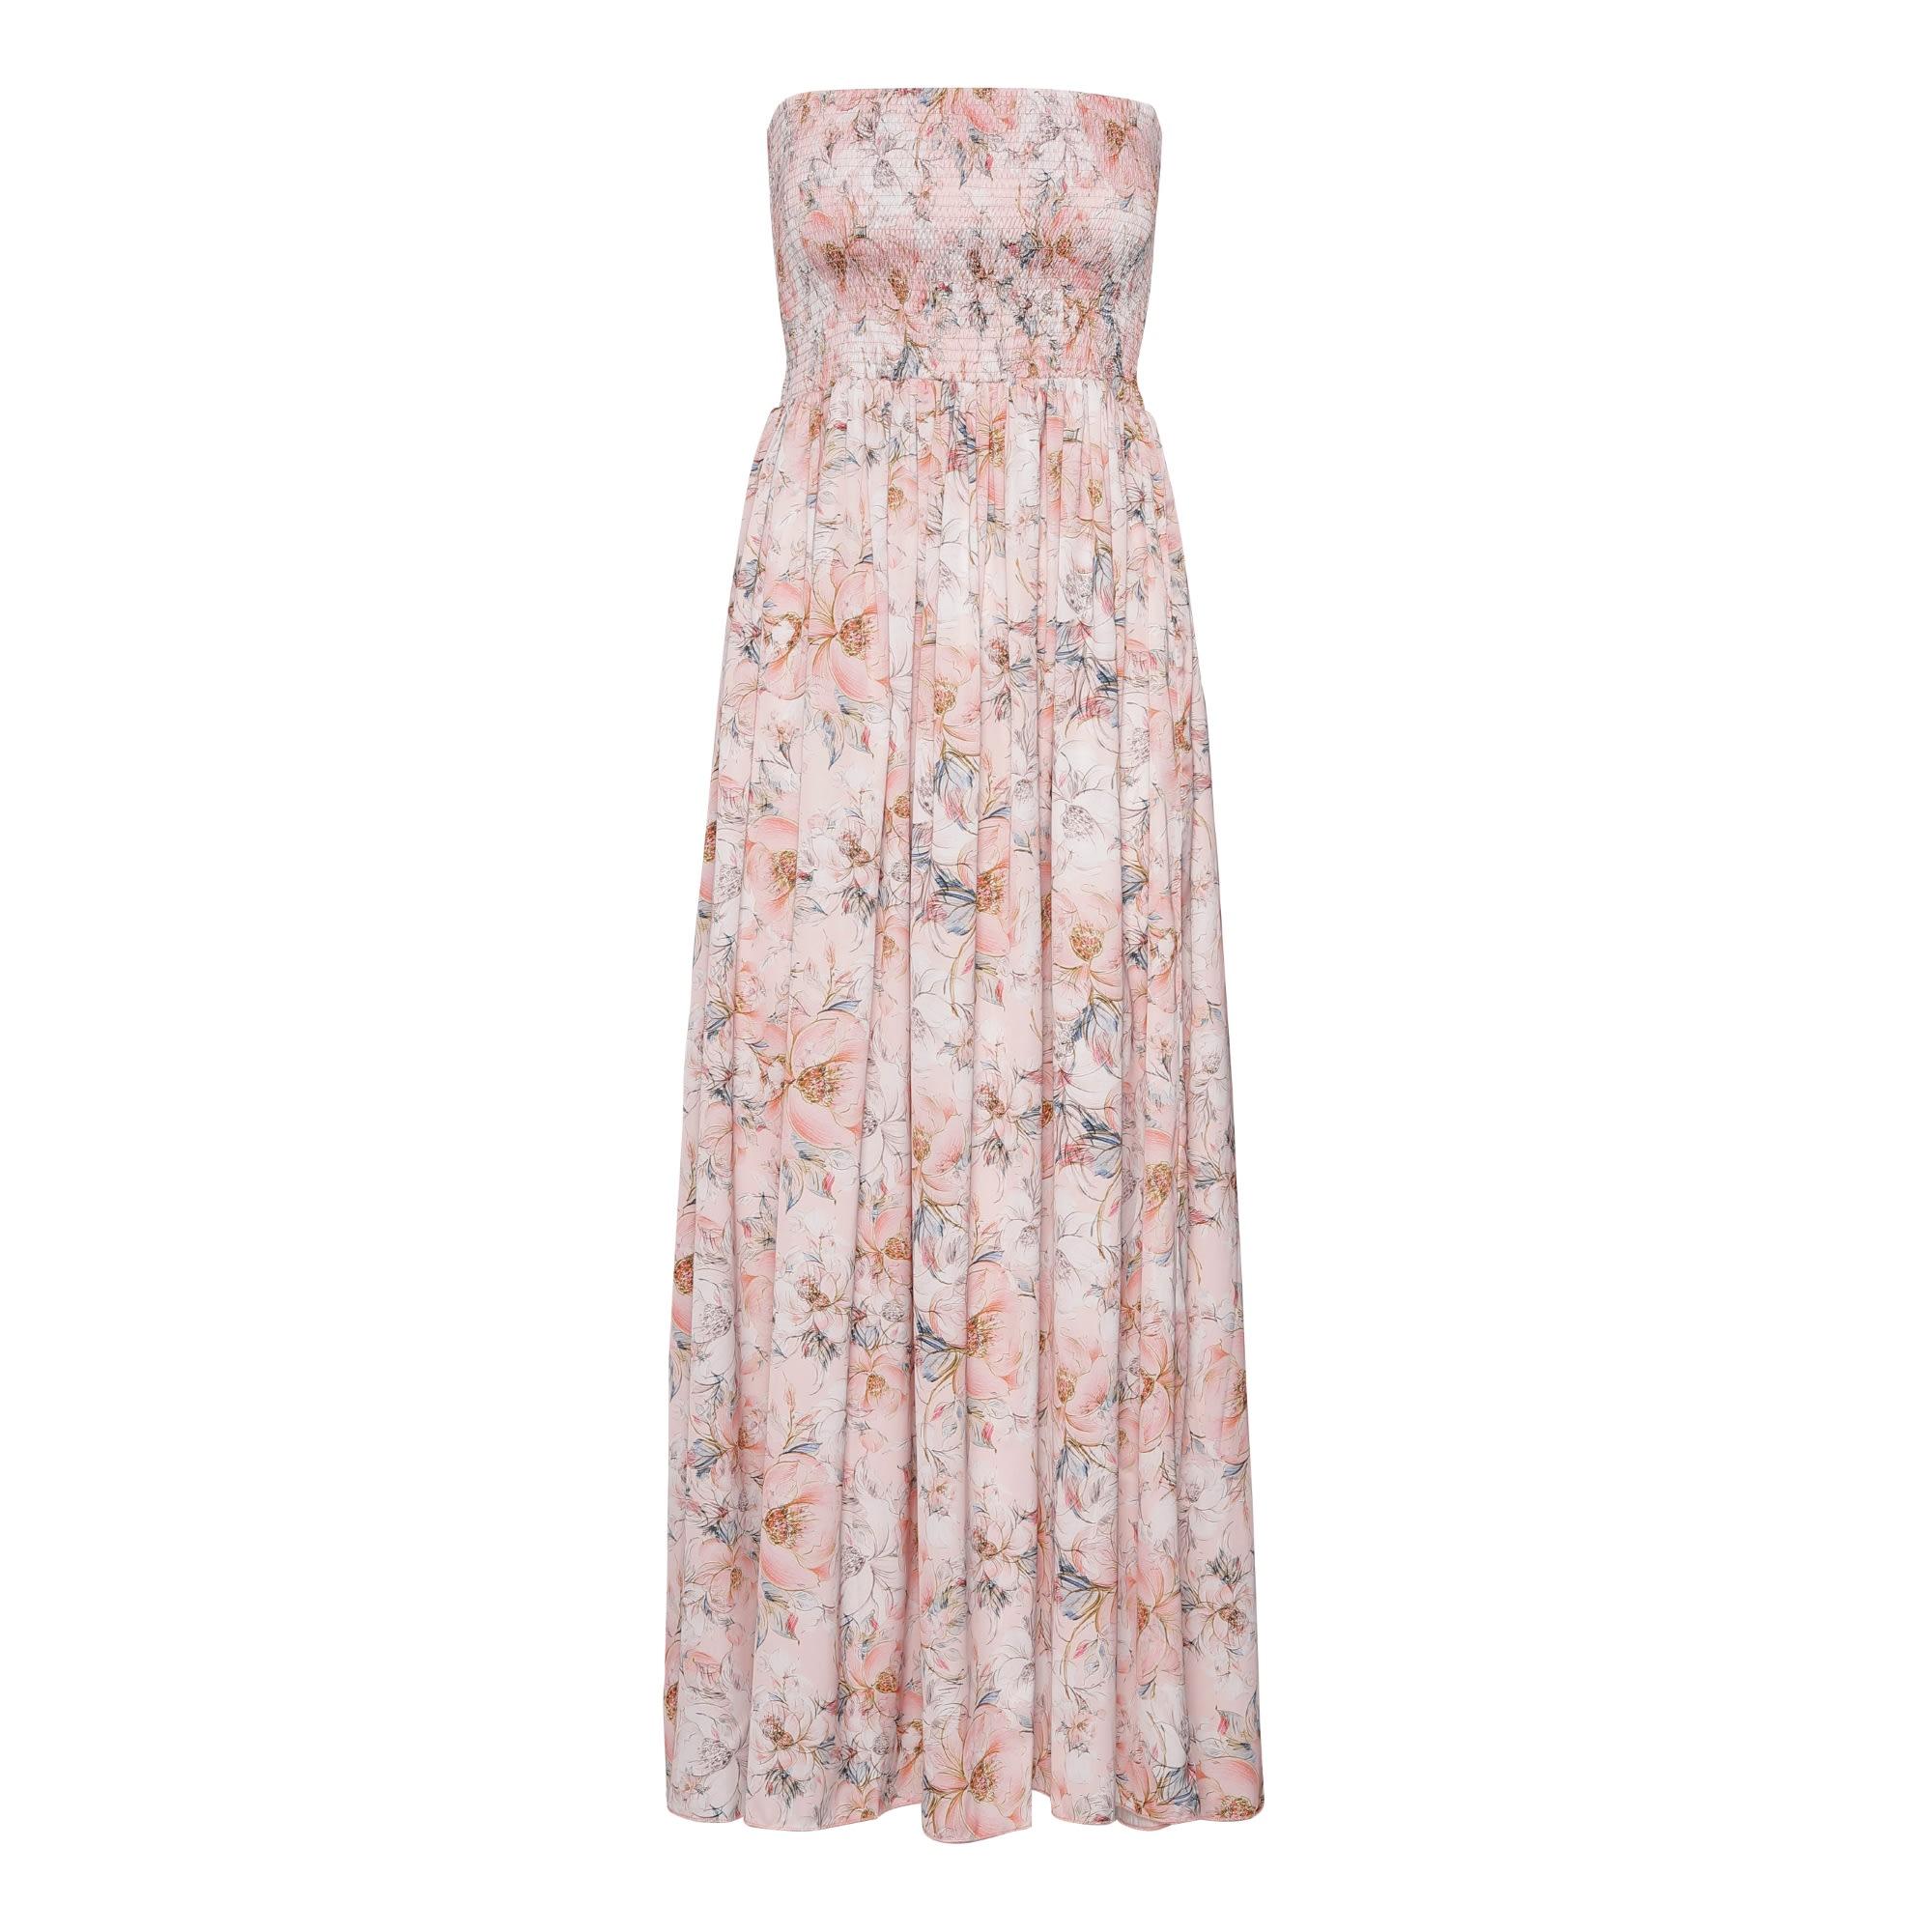 Juliette Dress - Blossom Peach Karmamia IMAGE BY ME